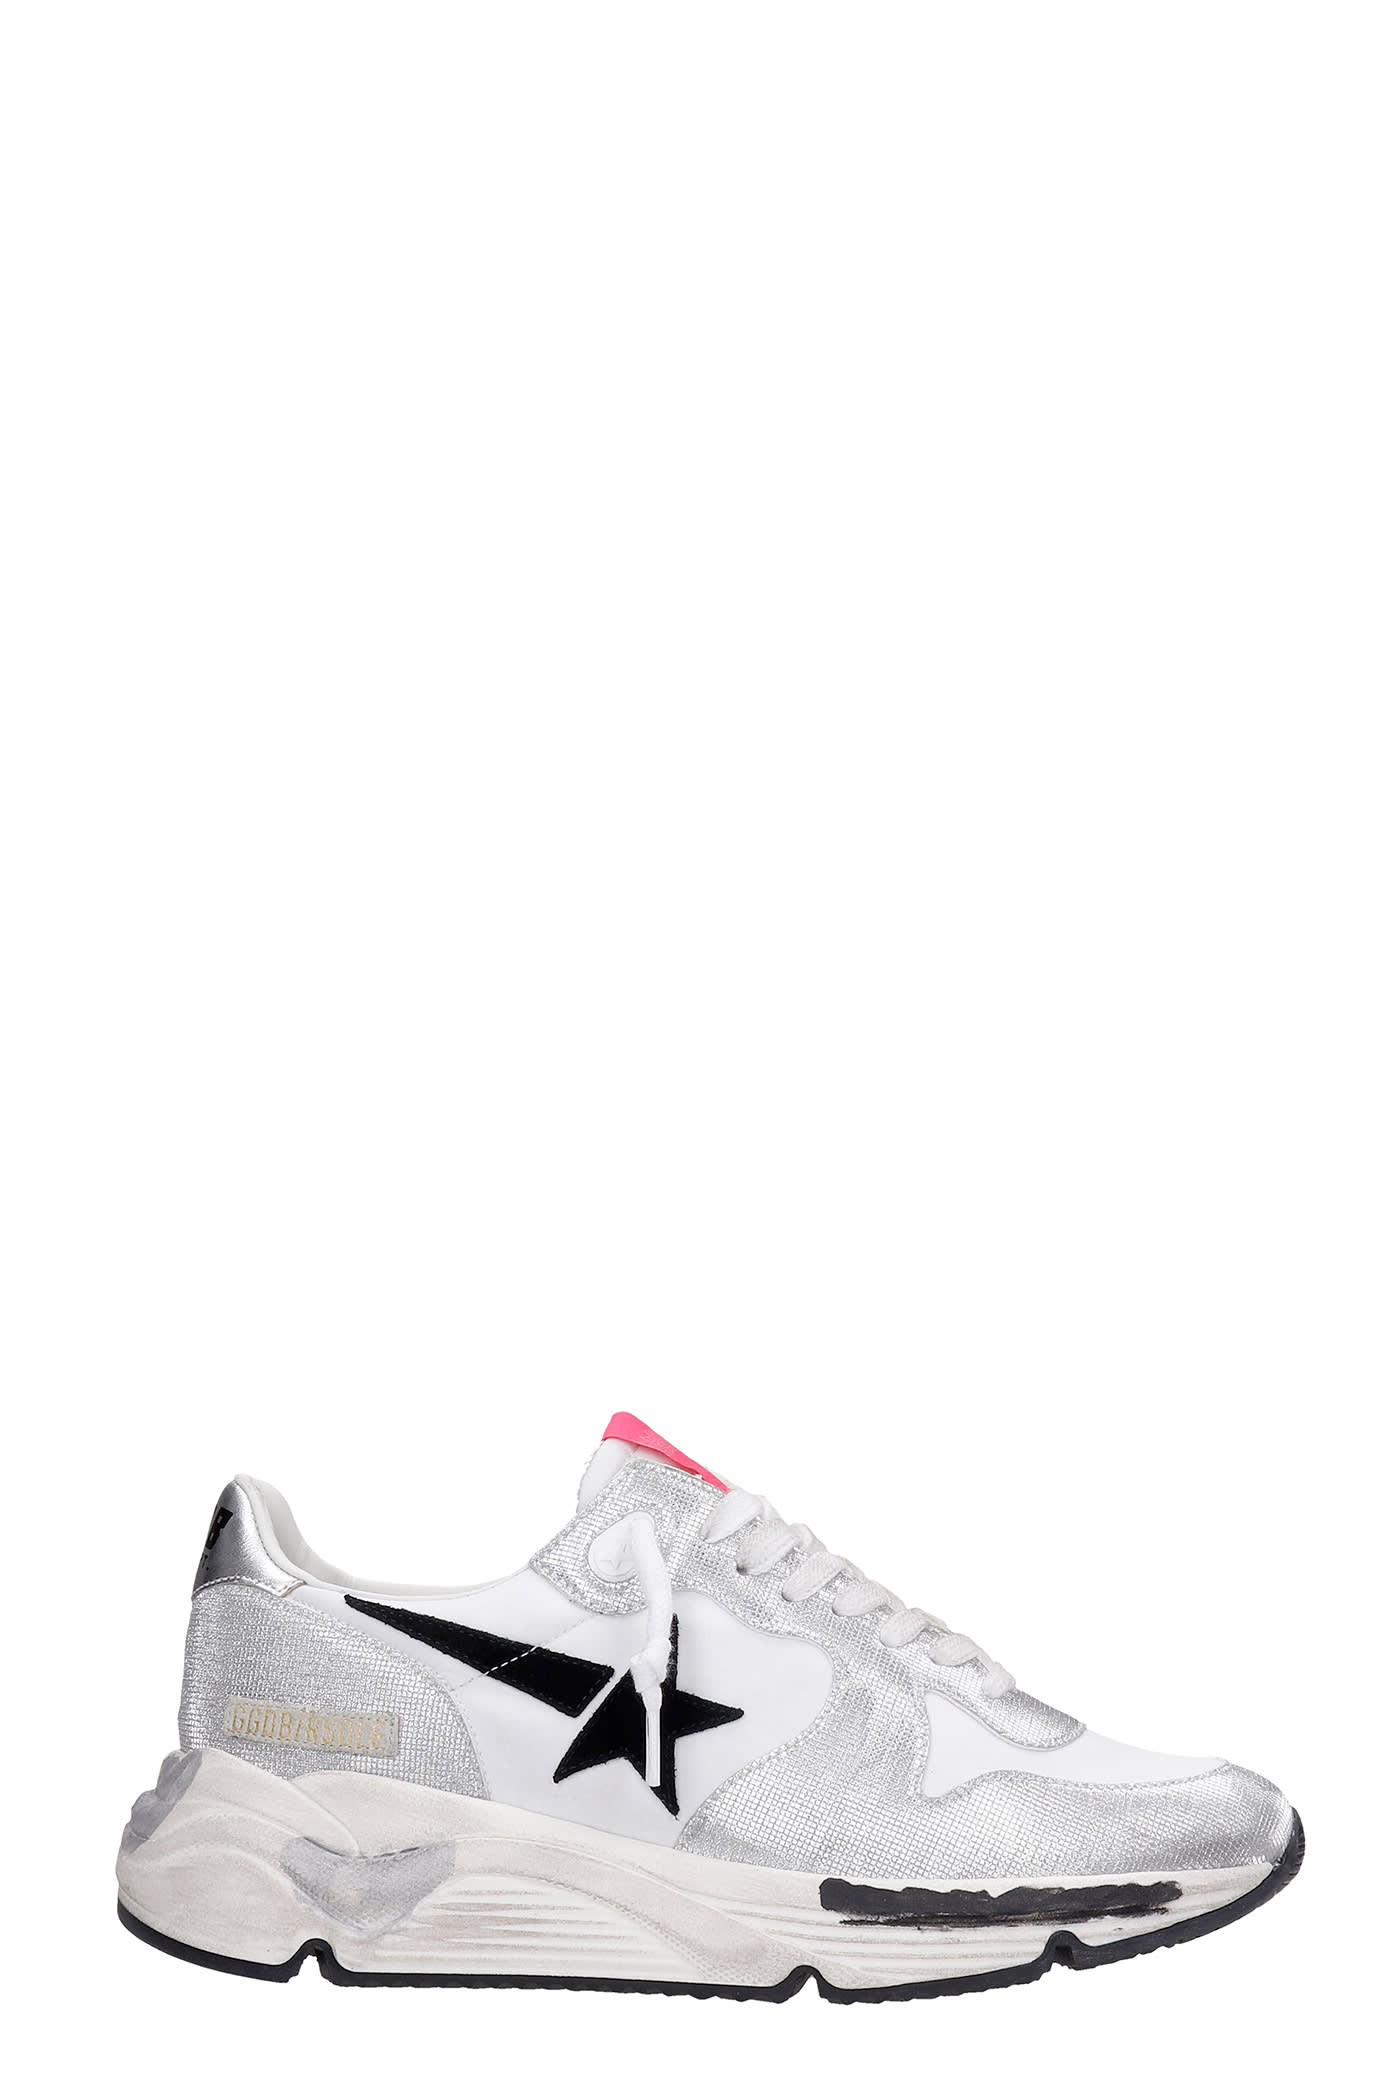 Golden Goose Running Sneakers In Silver Synthetic Fibers